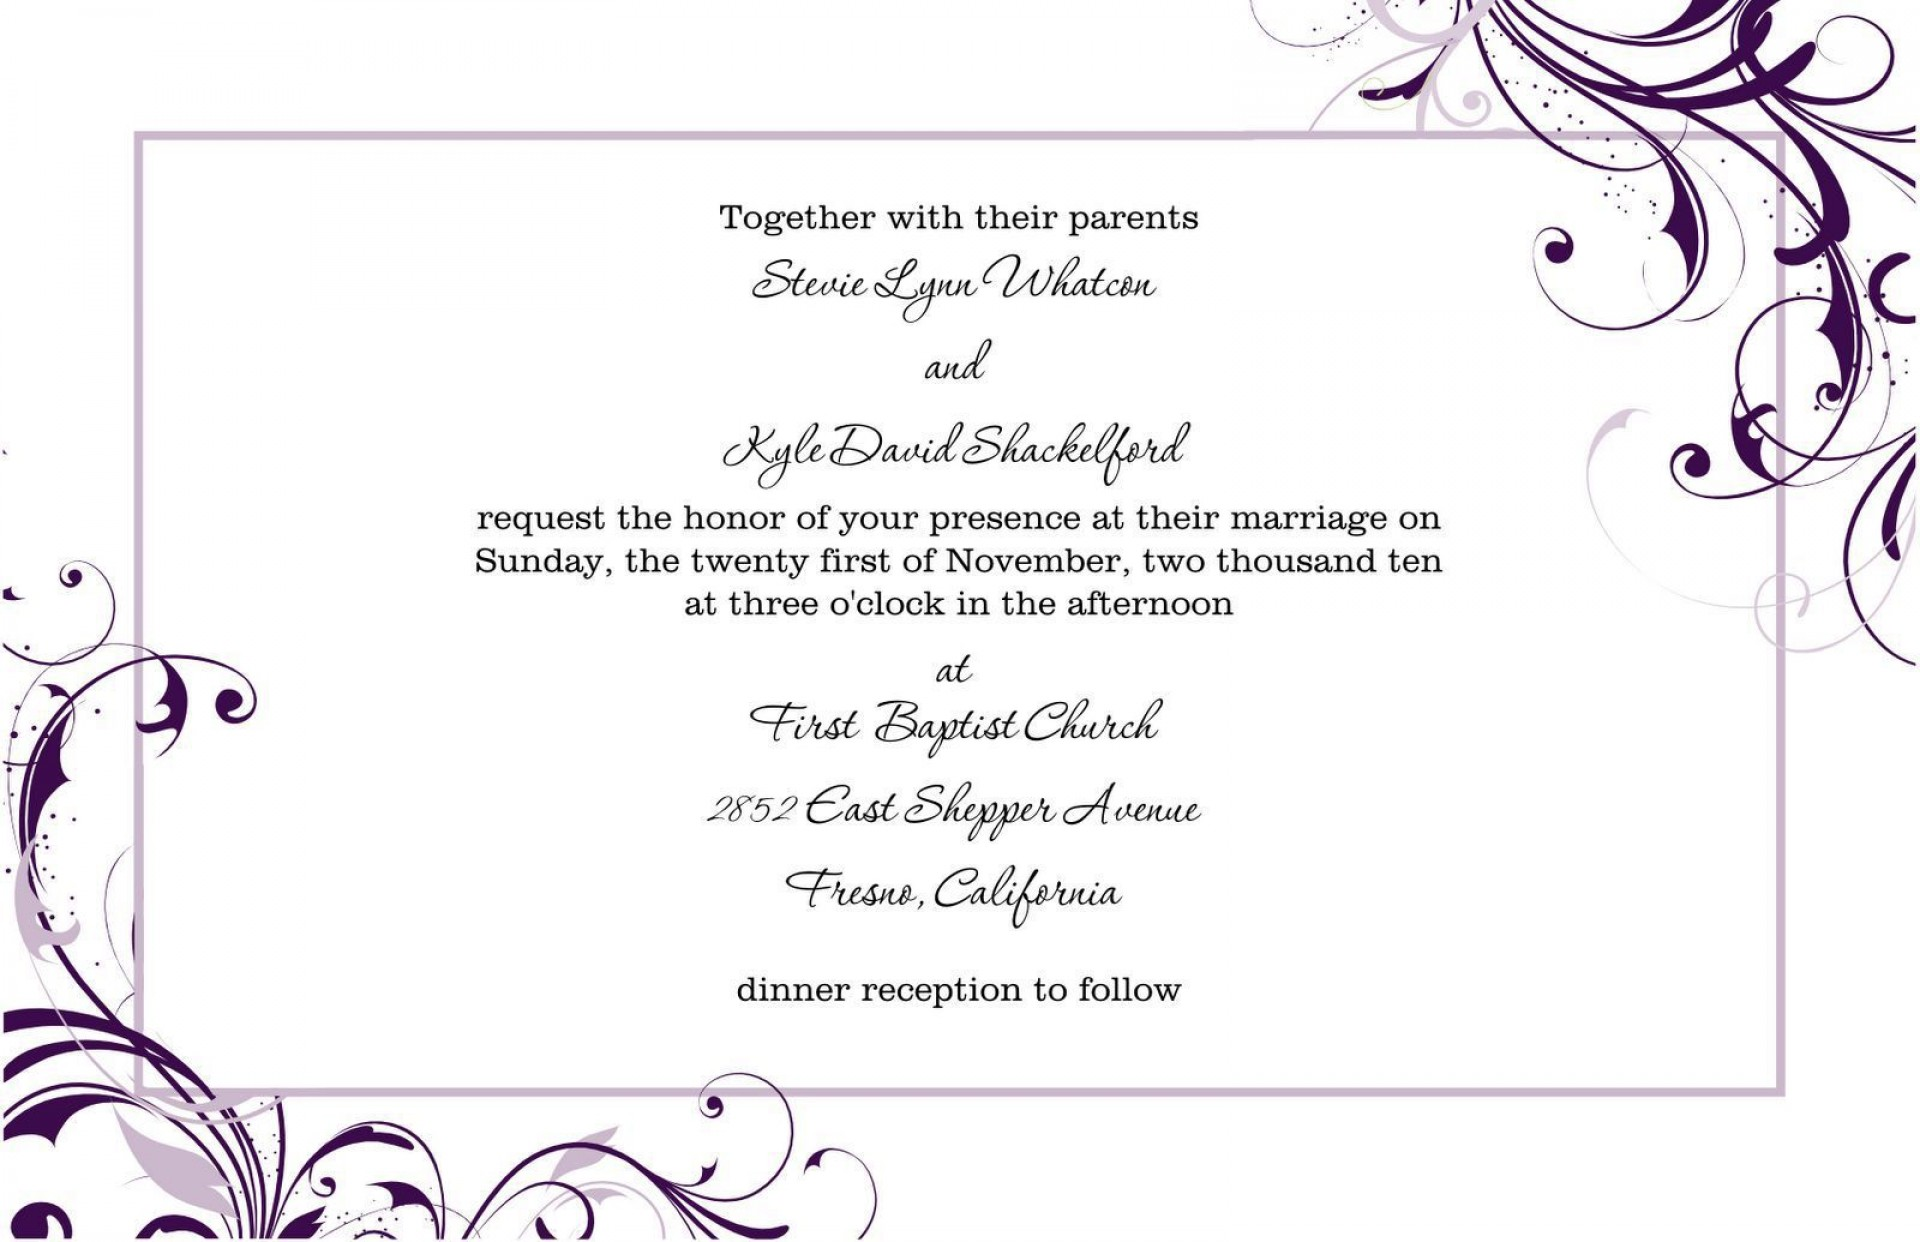 006 Stunning Formal Wedding Invitation Template Free High Resolution 1920